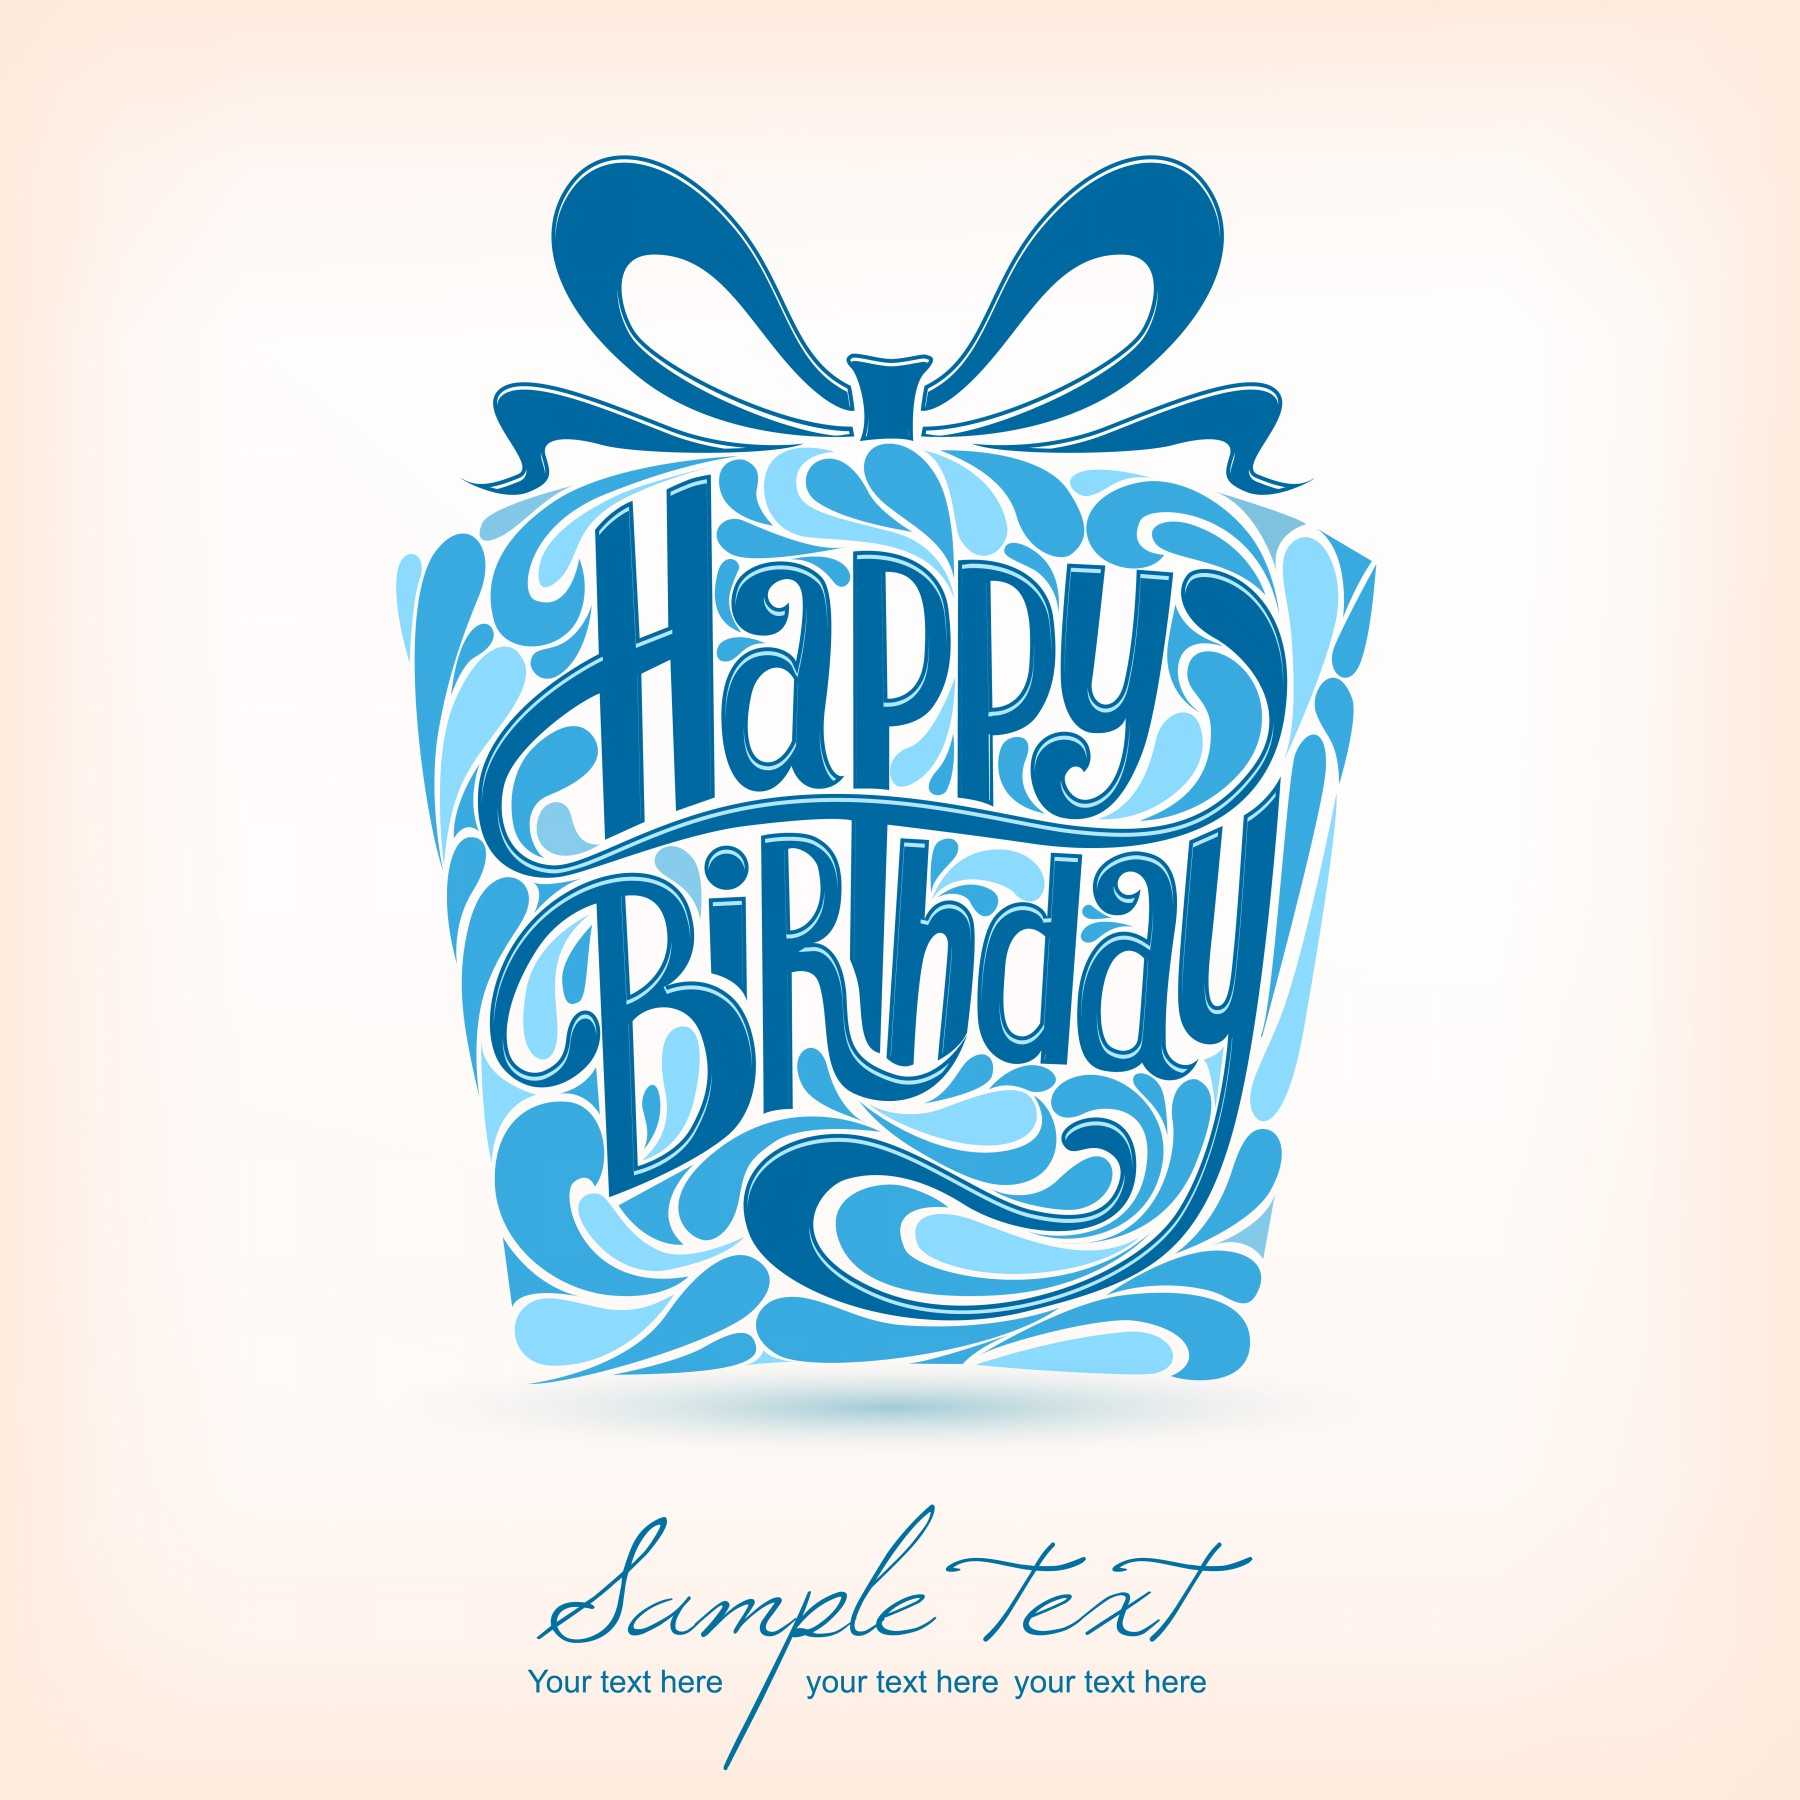 Free Birthday Greeting Cards Latest Optimum Designs Elsoar – Birthday Greeting Designs